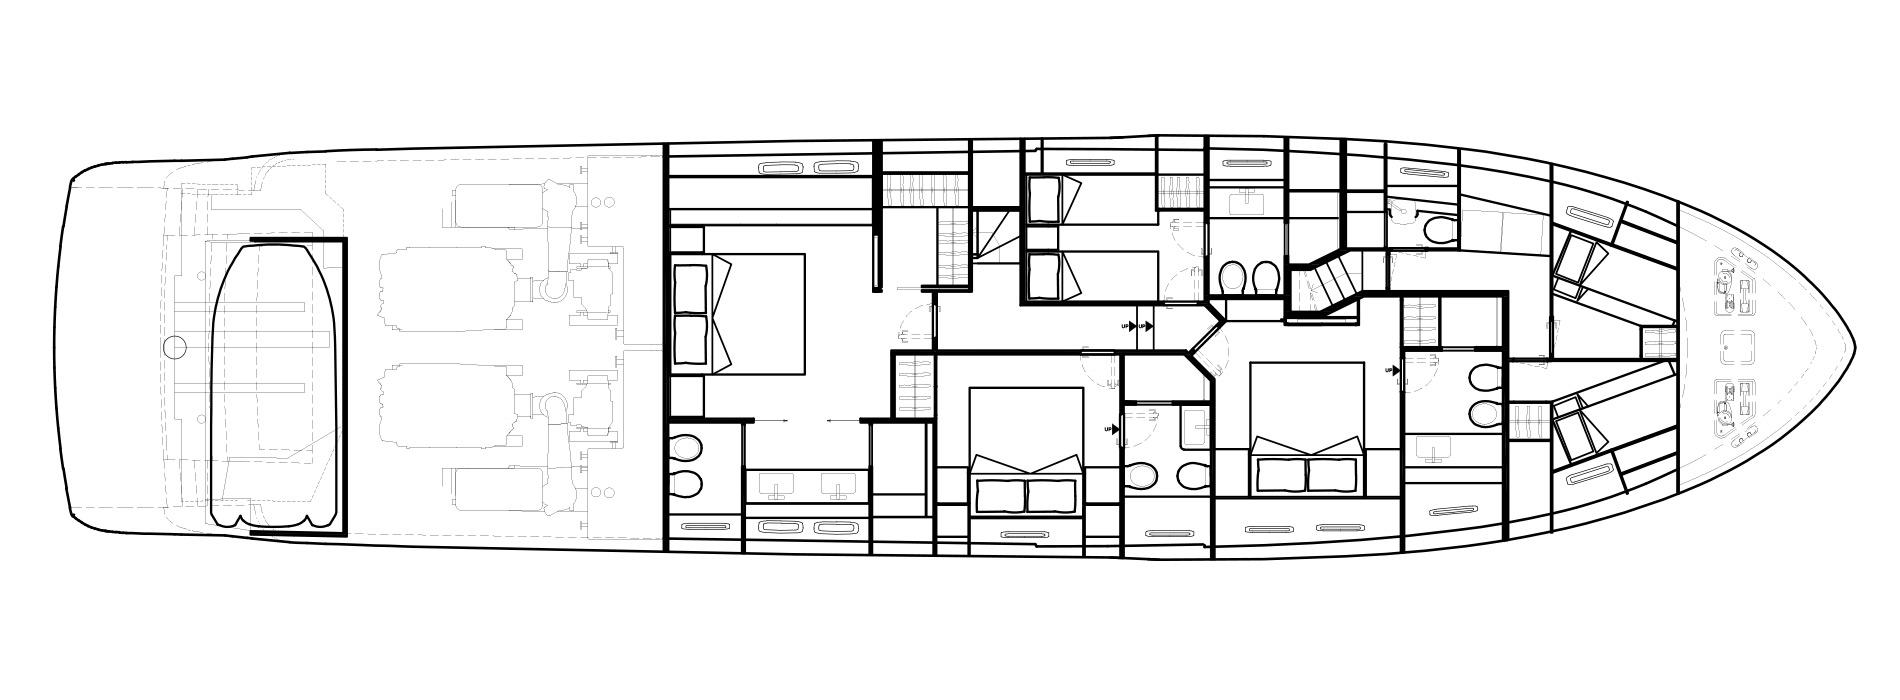 Sanlorenzo Yachts SL86 Lower Deck Version B